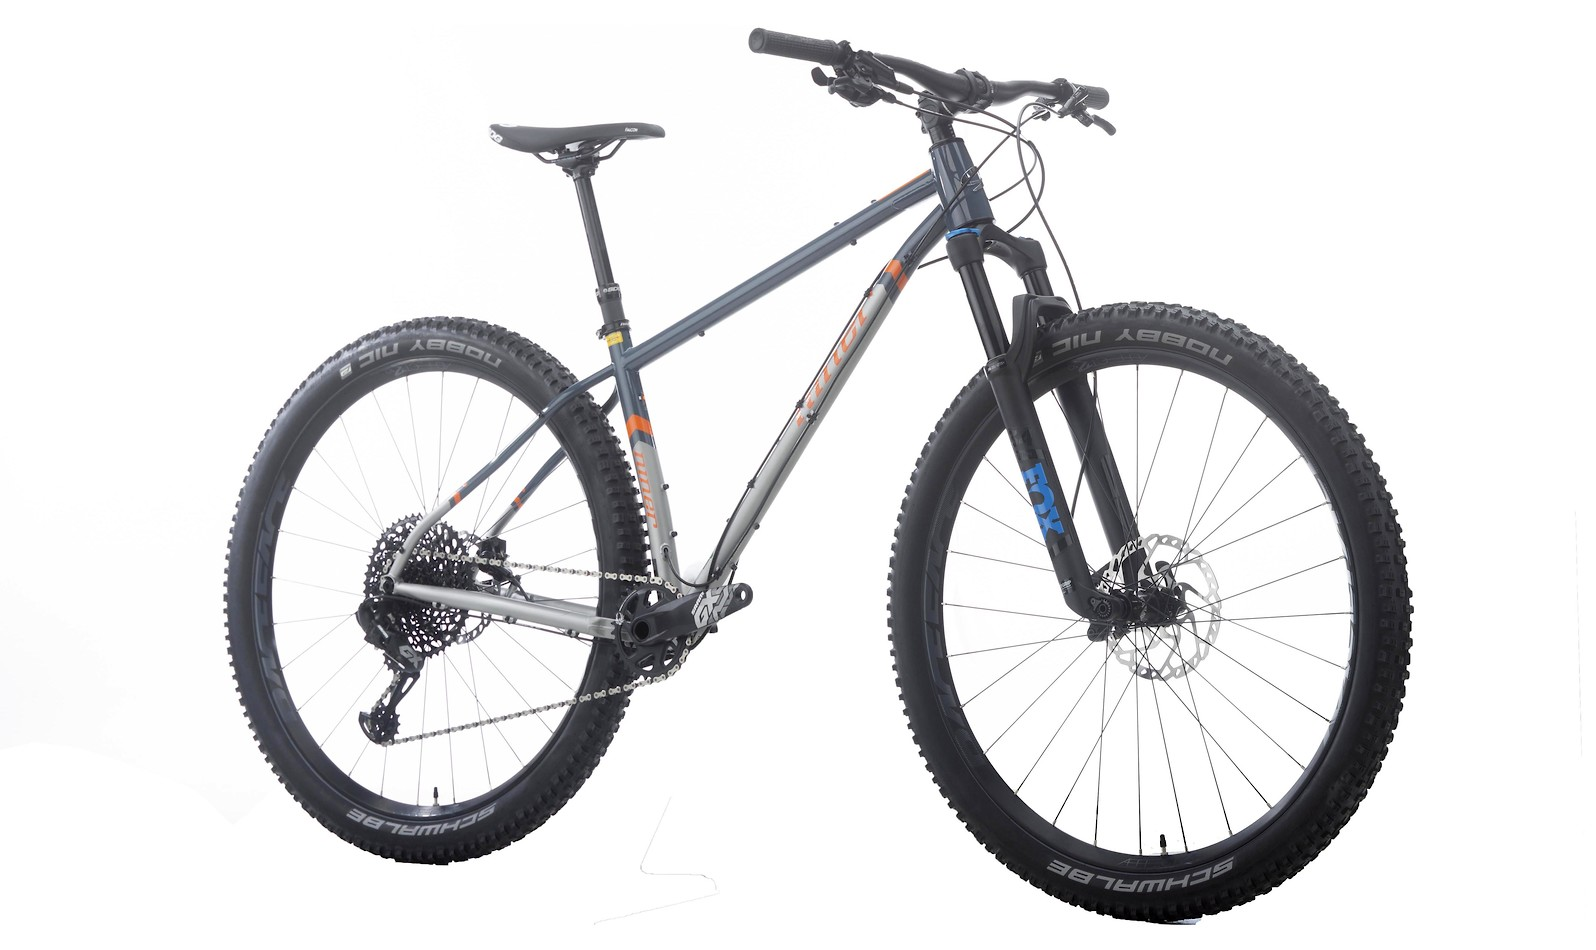 Niner SIR 9 GX Eagle Jenson USA Exclusive Build